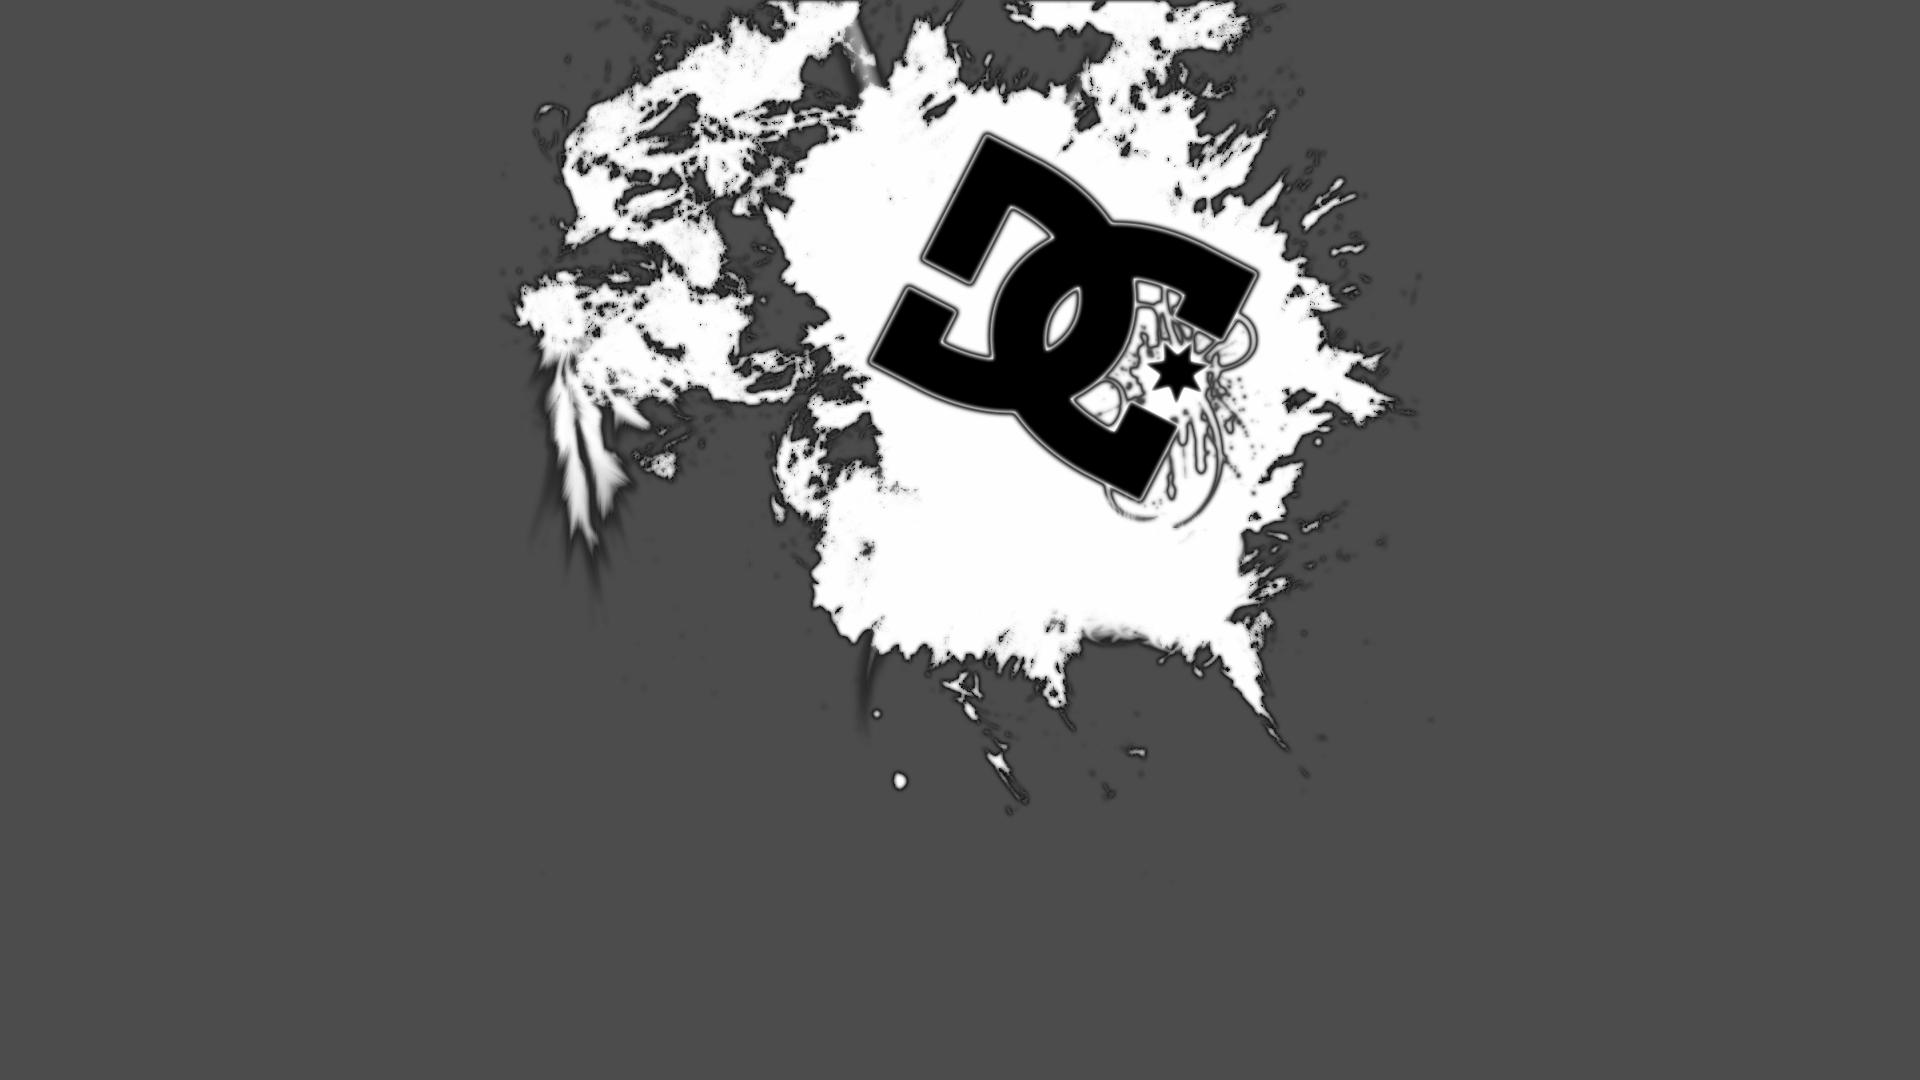 Dc logo wallpapers wallpaper cave download dc skate logo wallpaper free desktop 8 hd wallpapers full altavistaventures Images